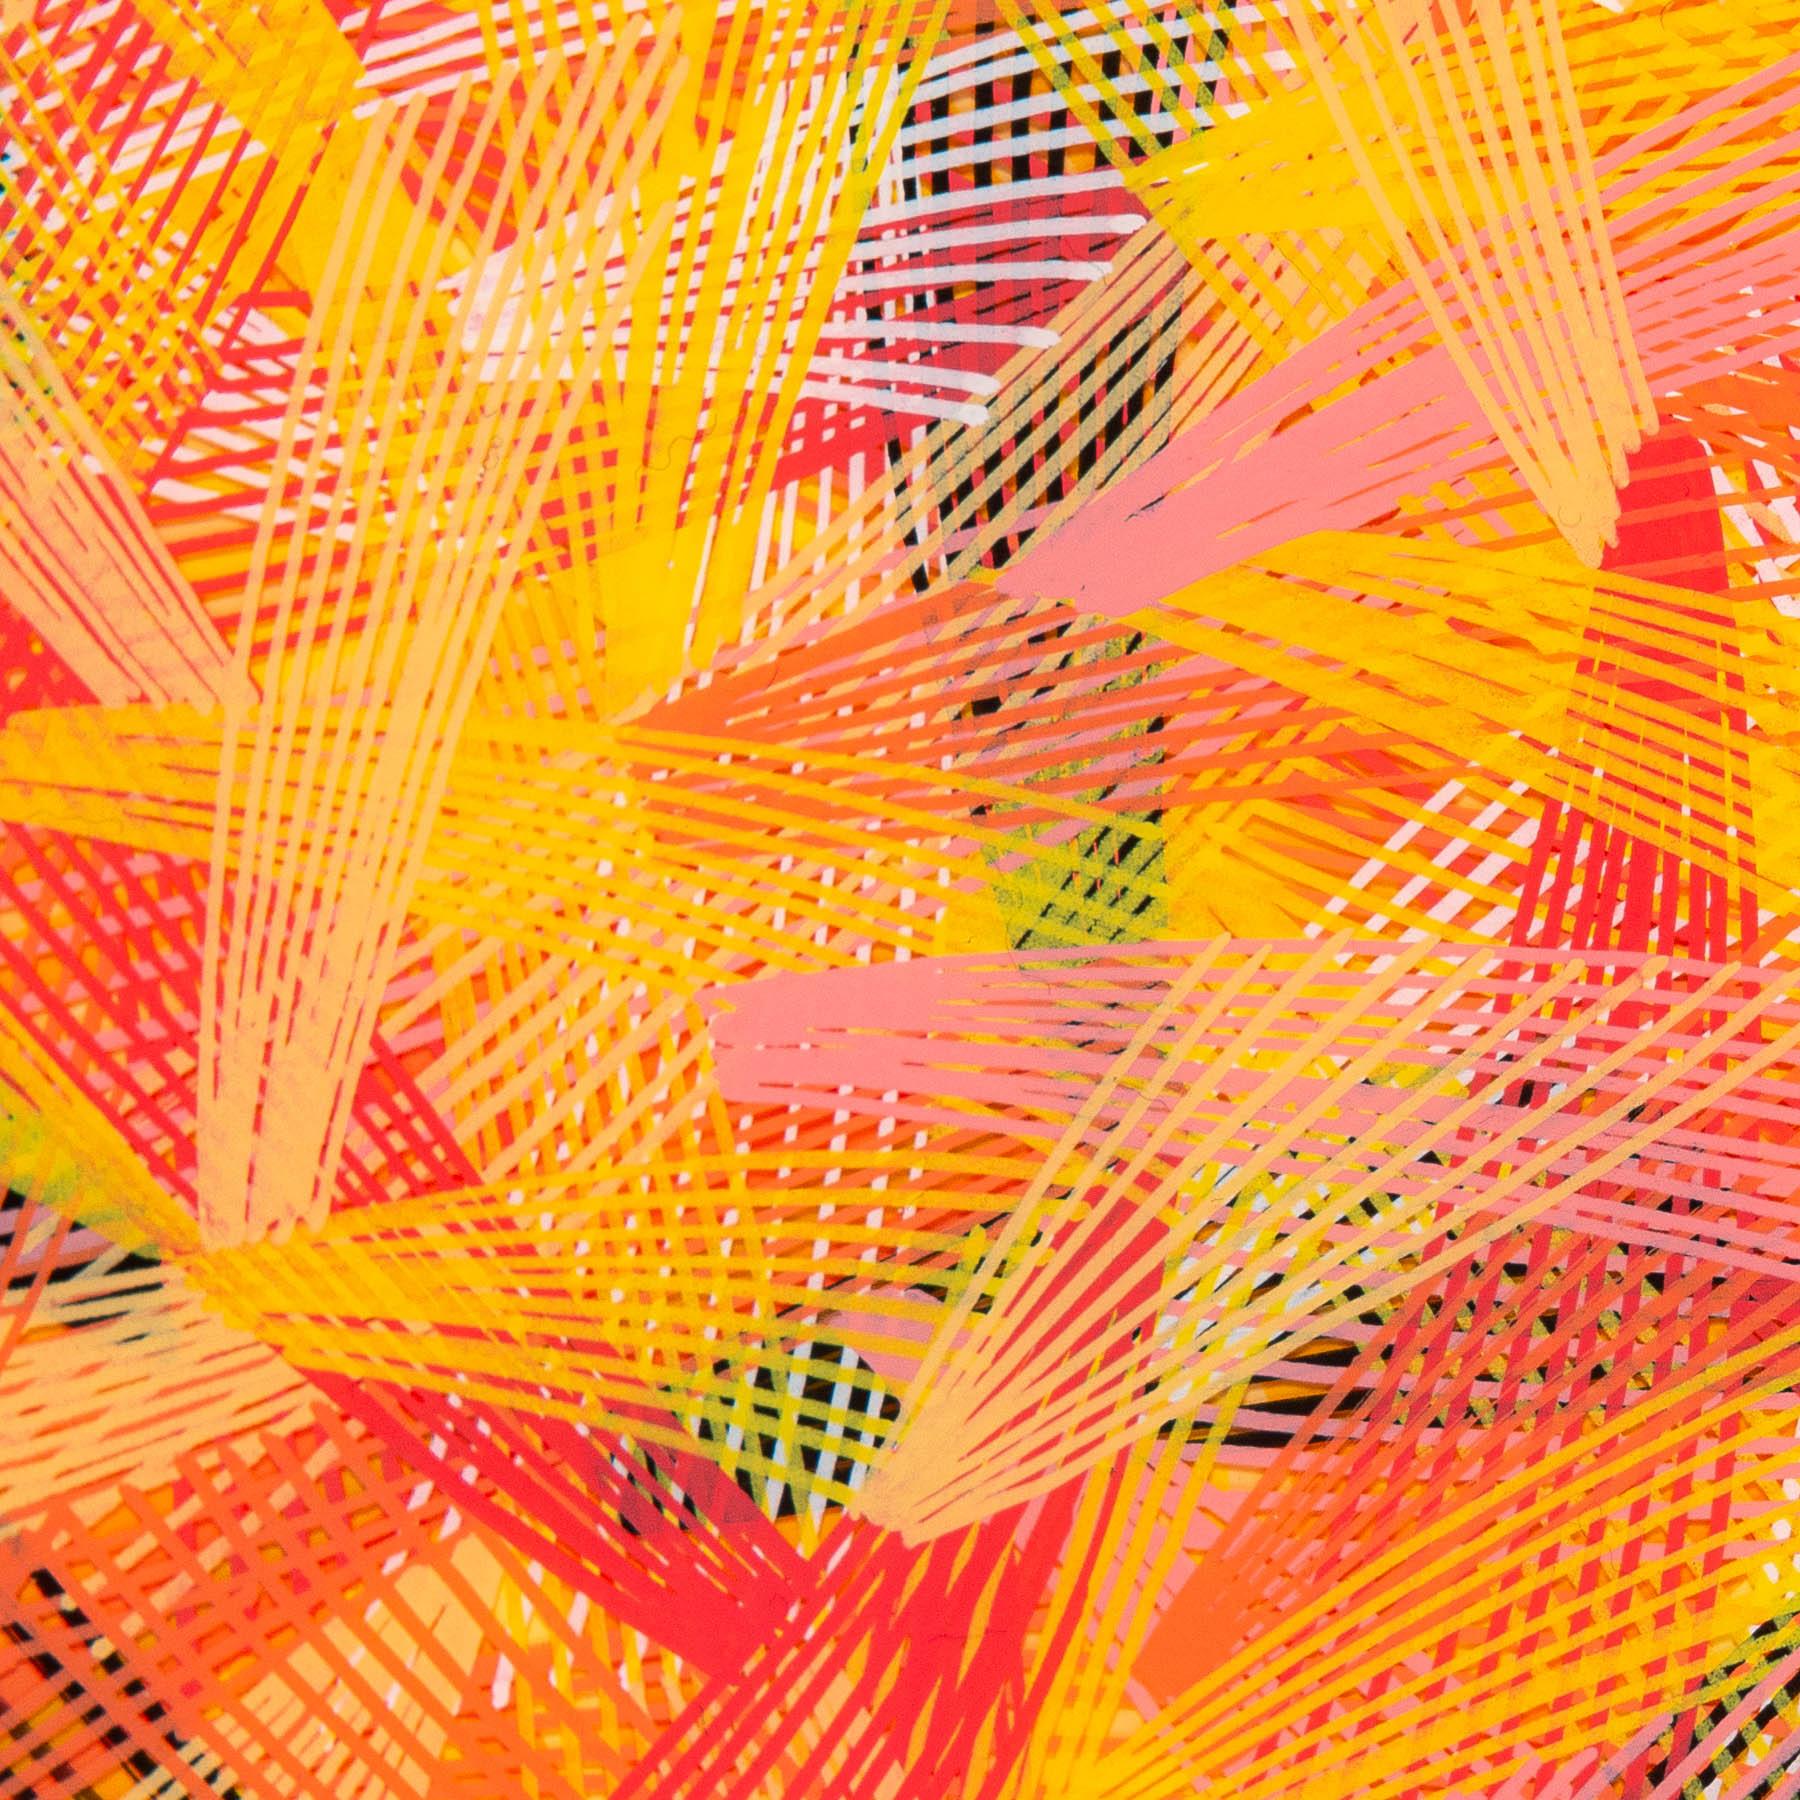 newsprint, tangerine, edition, newsprint tangerine edition, 8 inches diameter, circular canvas, naina redhu, naina.co, khaosphilos, handpainted, hand-painted, hand painted, indian contemporary art, indian contemporary artist, round canvas, acrylics on canvas, fine art, impressionism, hatching, stippling, line art, geometric abstraction, yellow, orange, lines, black, white, madeinindia, makeinindia, khaos philos, make in india, made in india, handmade in india, handmadeinindia, canvas painting, painting, art indian art, art in india, indian artist